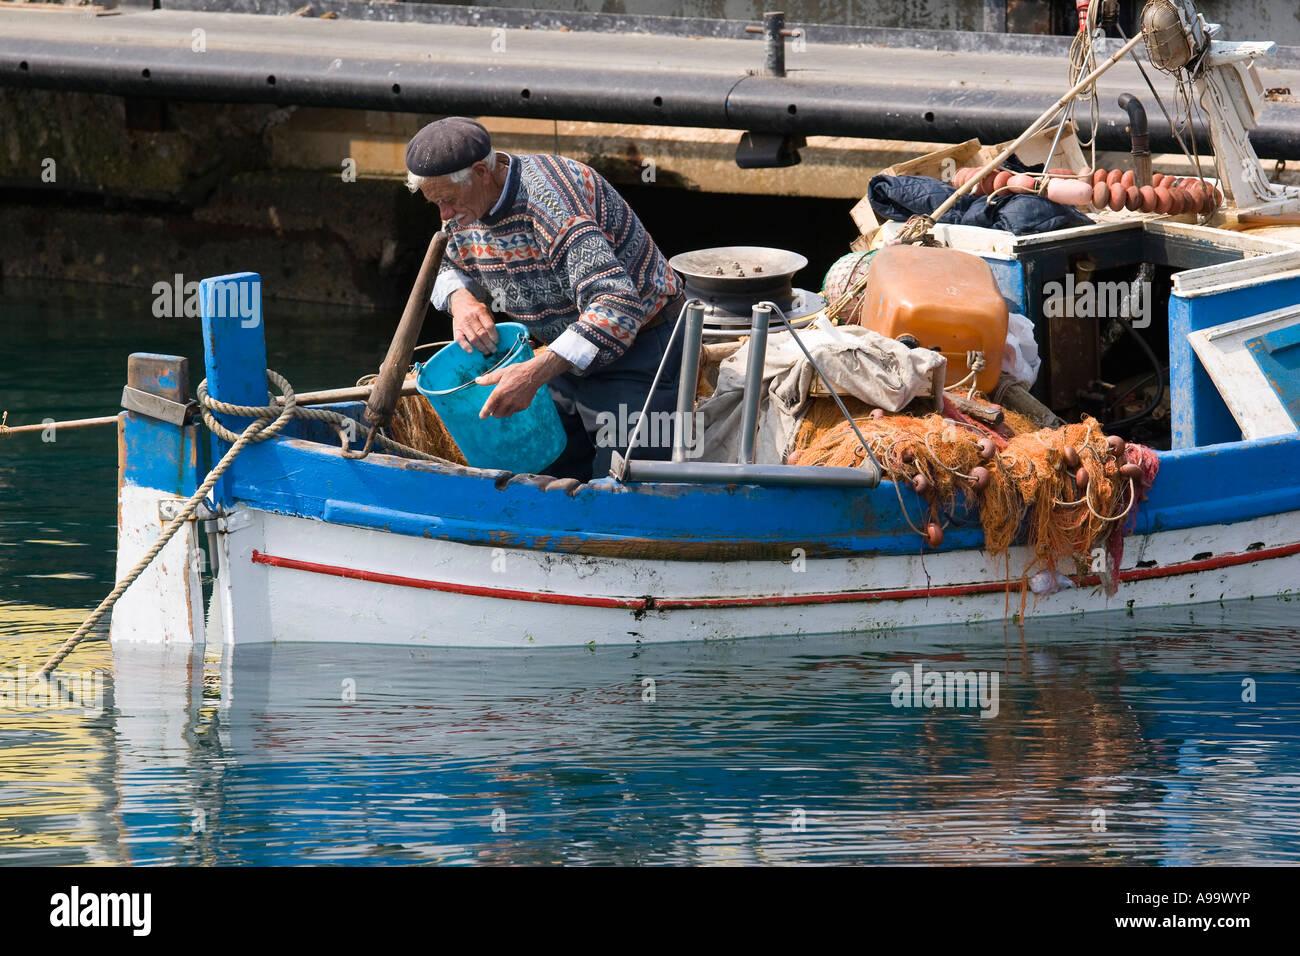 Sicilian fisherman on his boat at the docks Cefalu Sicily Italy - Stock Image